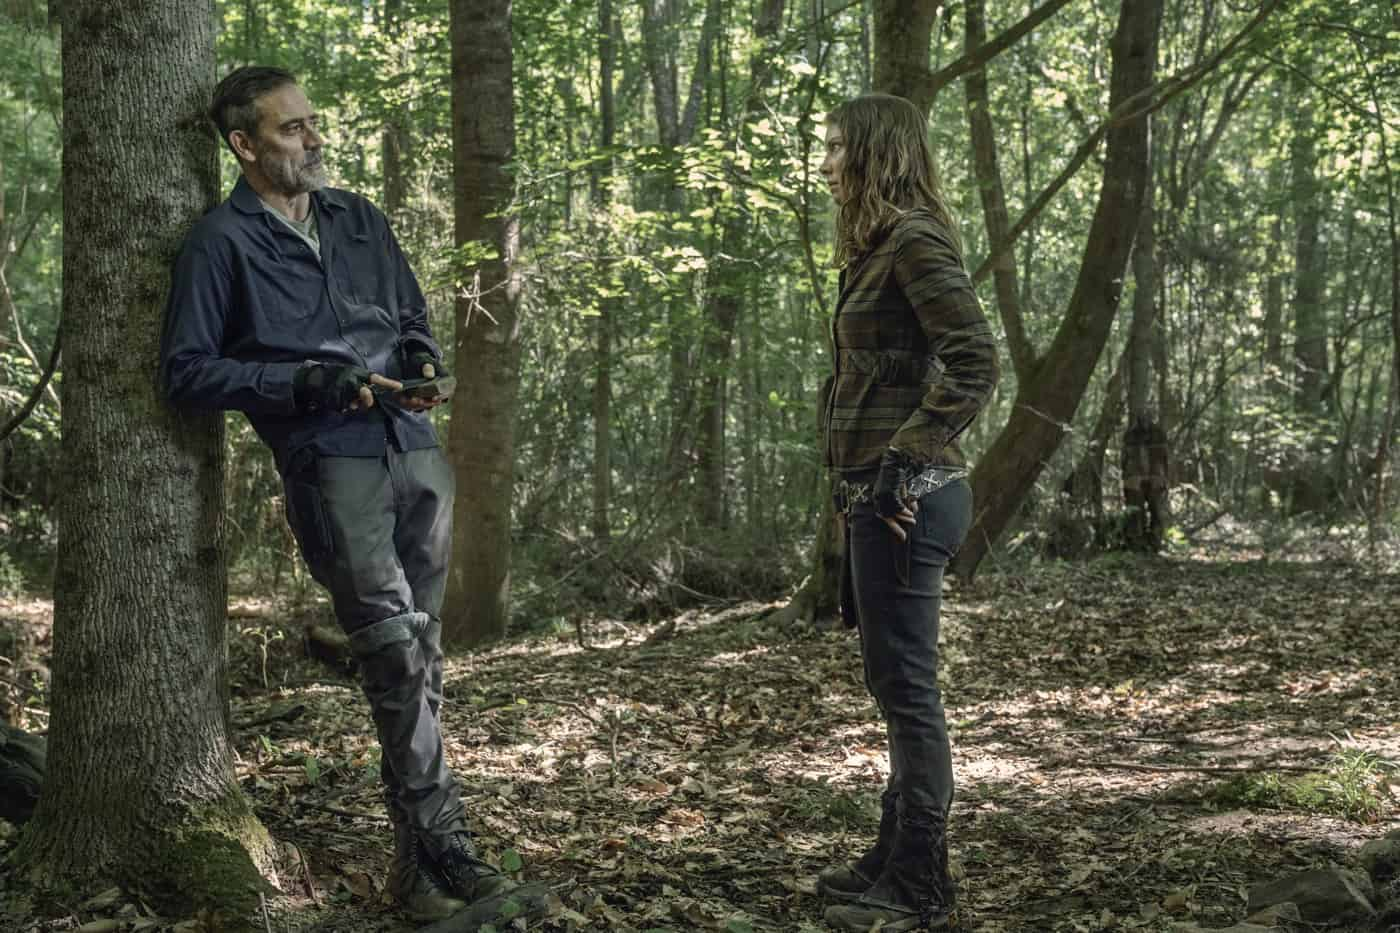 THE WALKING DEAD Season 11 Episode 7 Jeffrey Dean Morgan as Negan, Lauren Cohan as Maggie Rhee - The Walking Dead _ Season 11, Episode 7 - Photo Credit: Josh Stringer/AMC